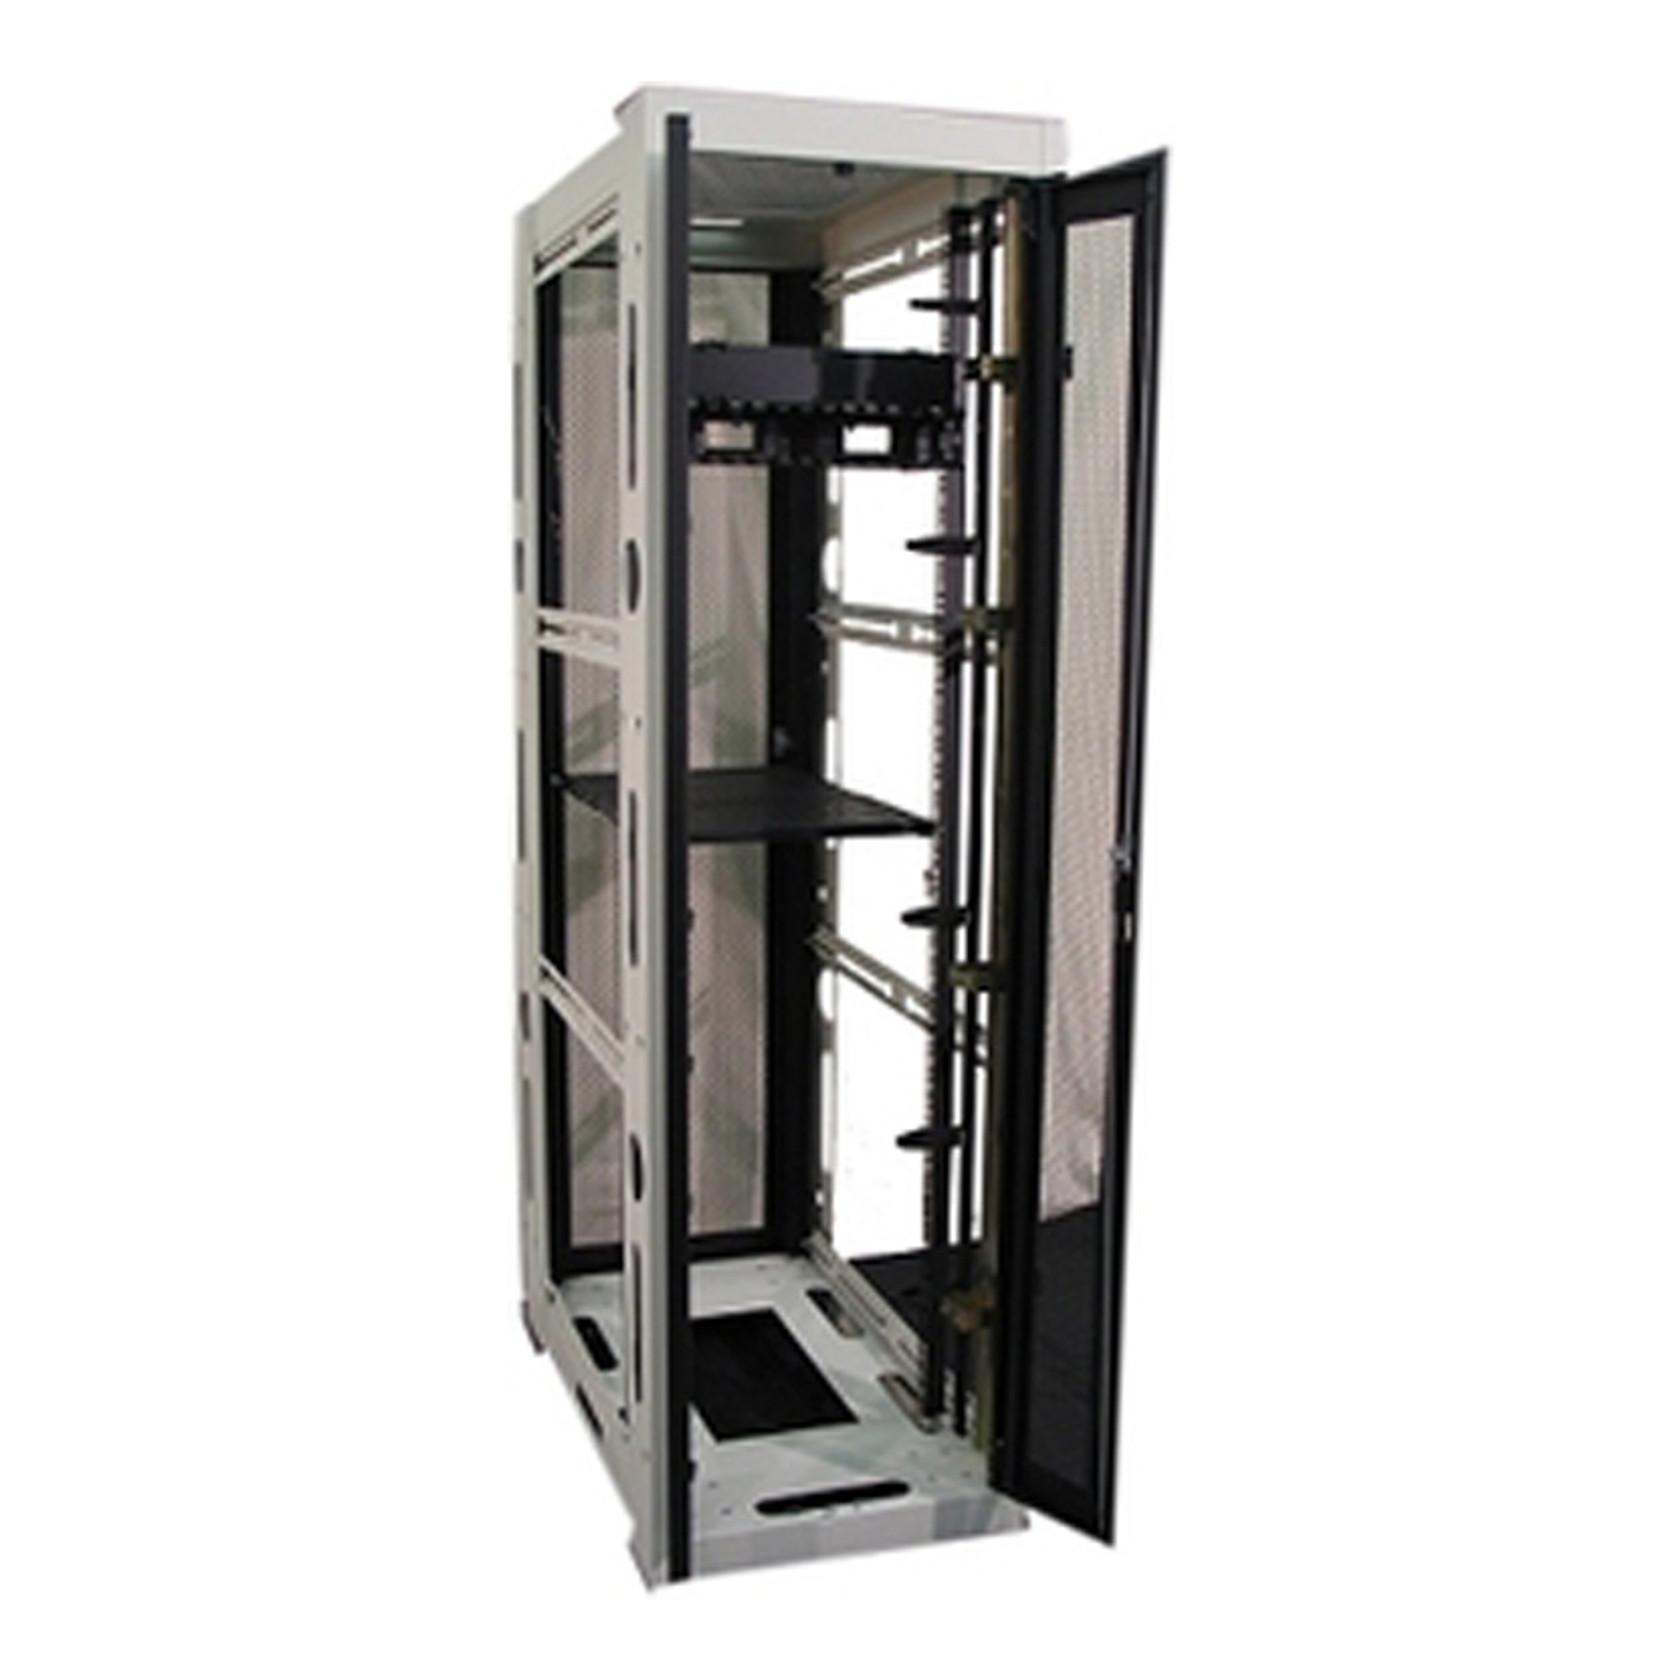 with photo racks datacenter server interior stock terminal rack room monitor in